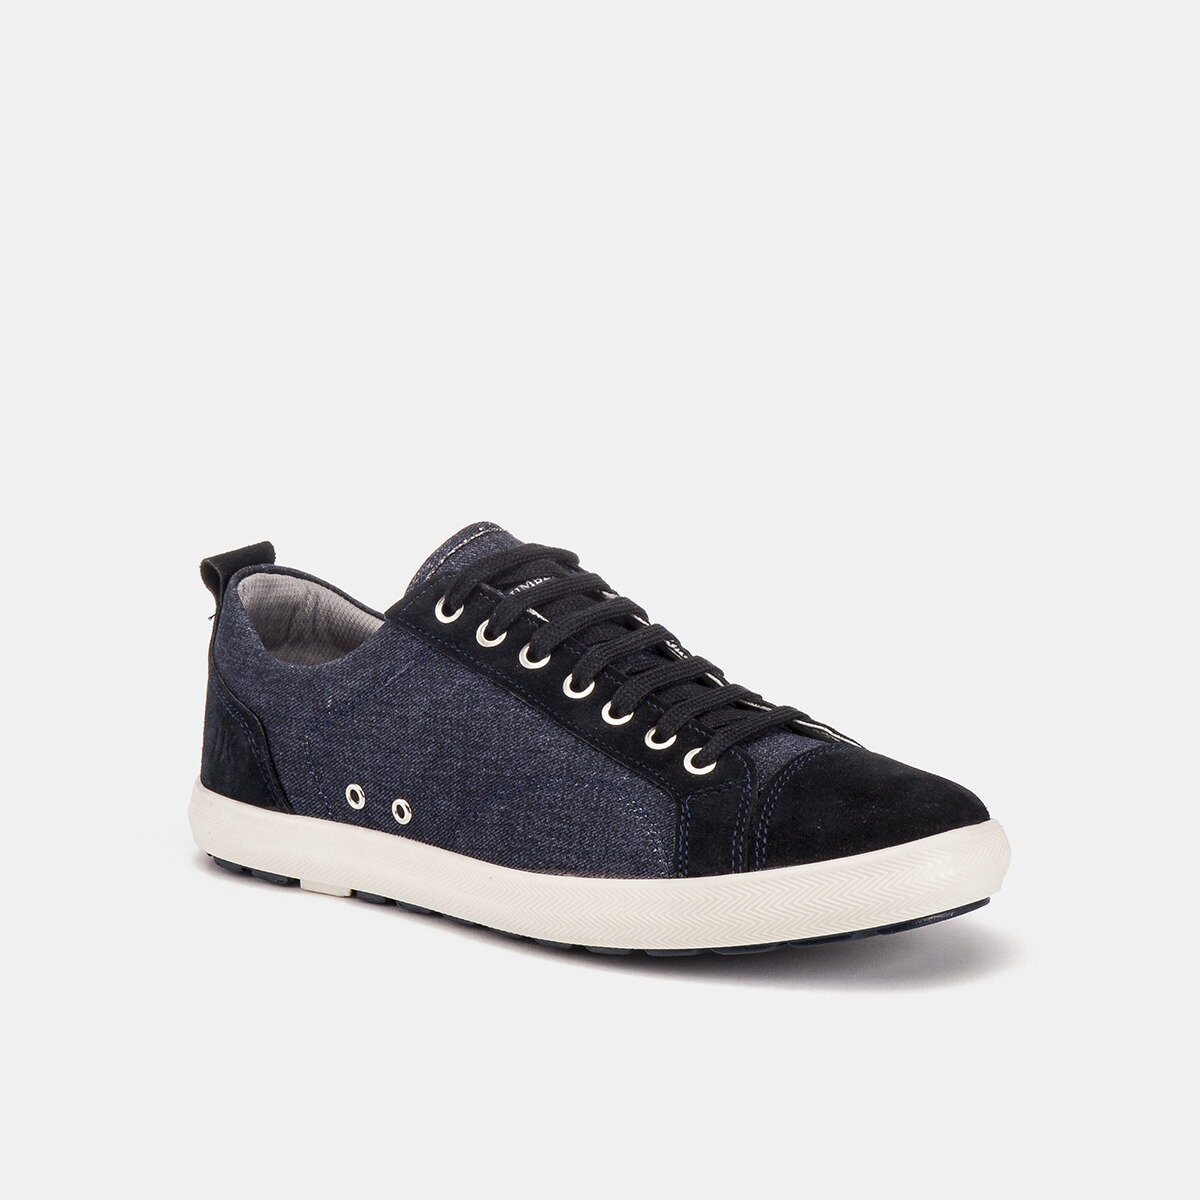 WOLF NAVY BLUE Man Sneakers